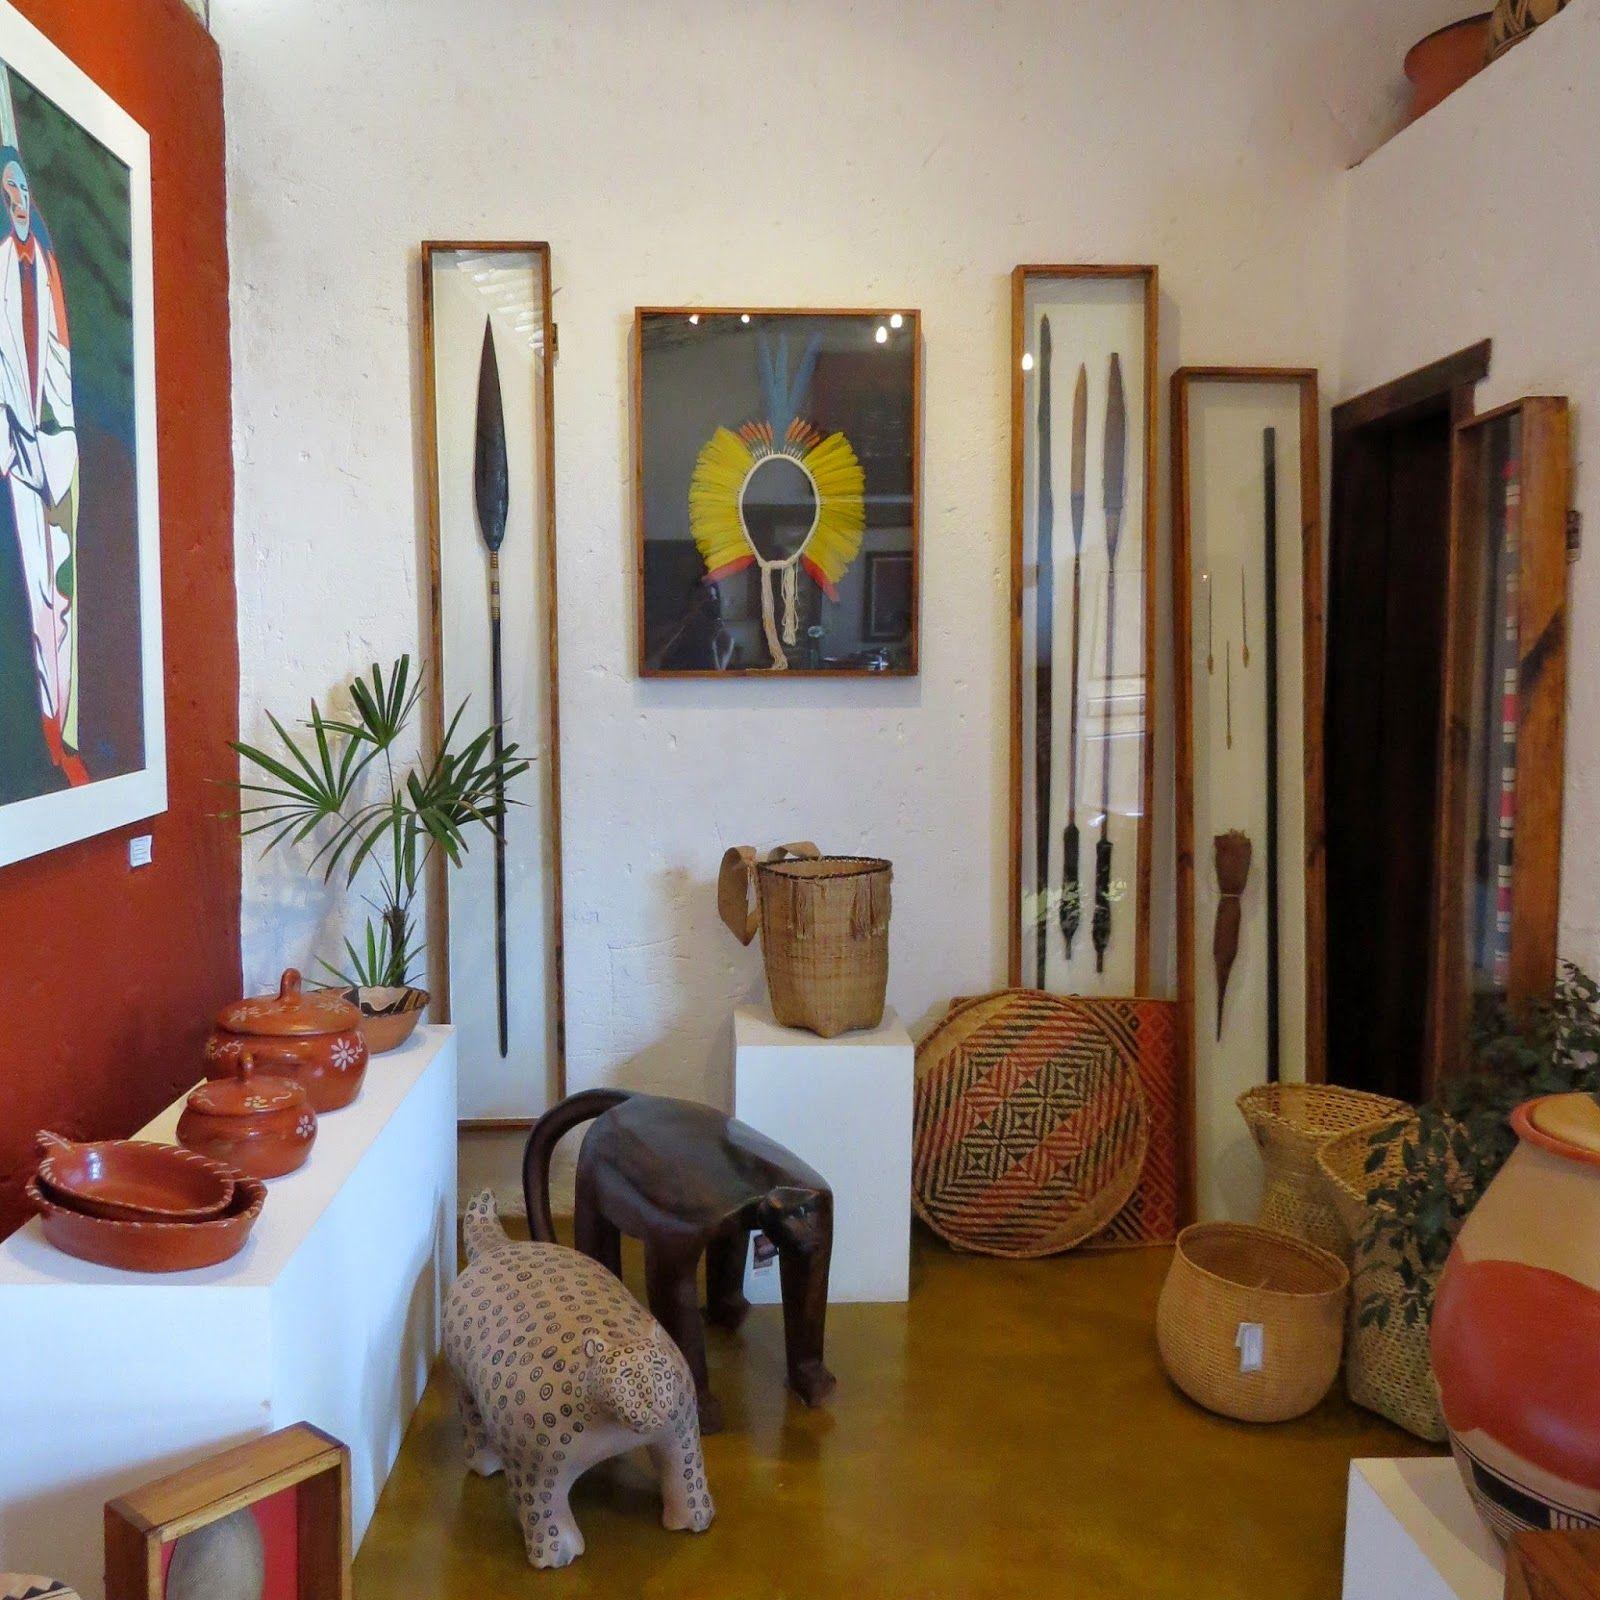 Narrow hallway storage solutions  MOITARA shop  Brazil  Pinterest  Shops and Brazil